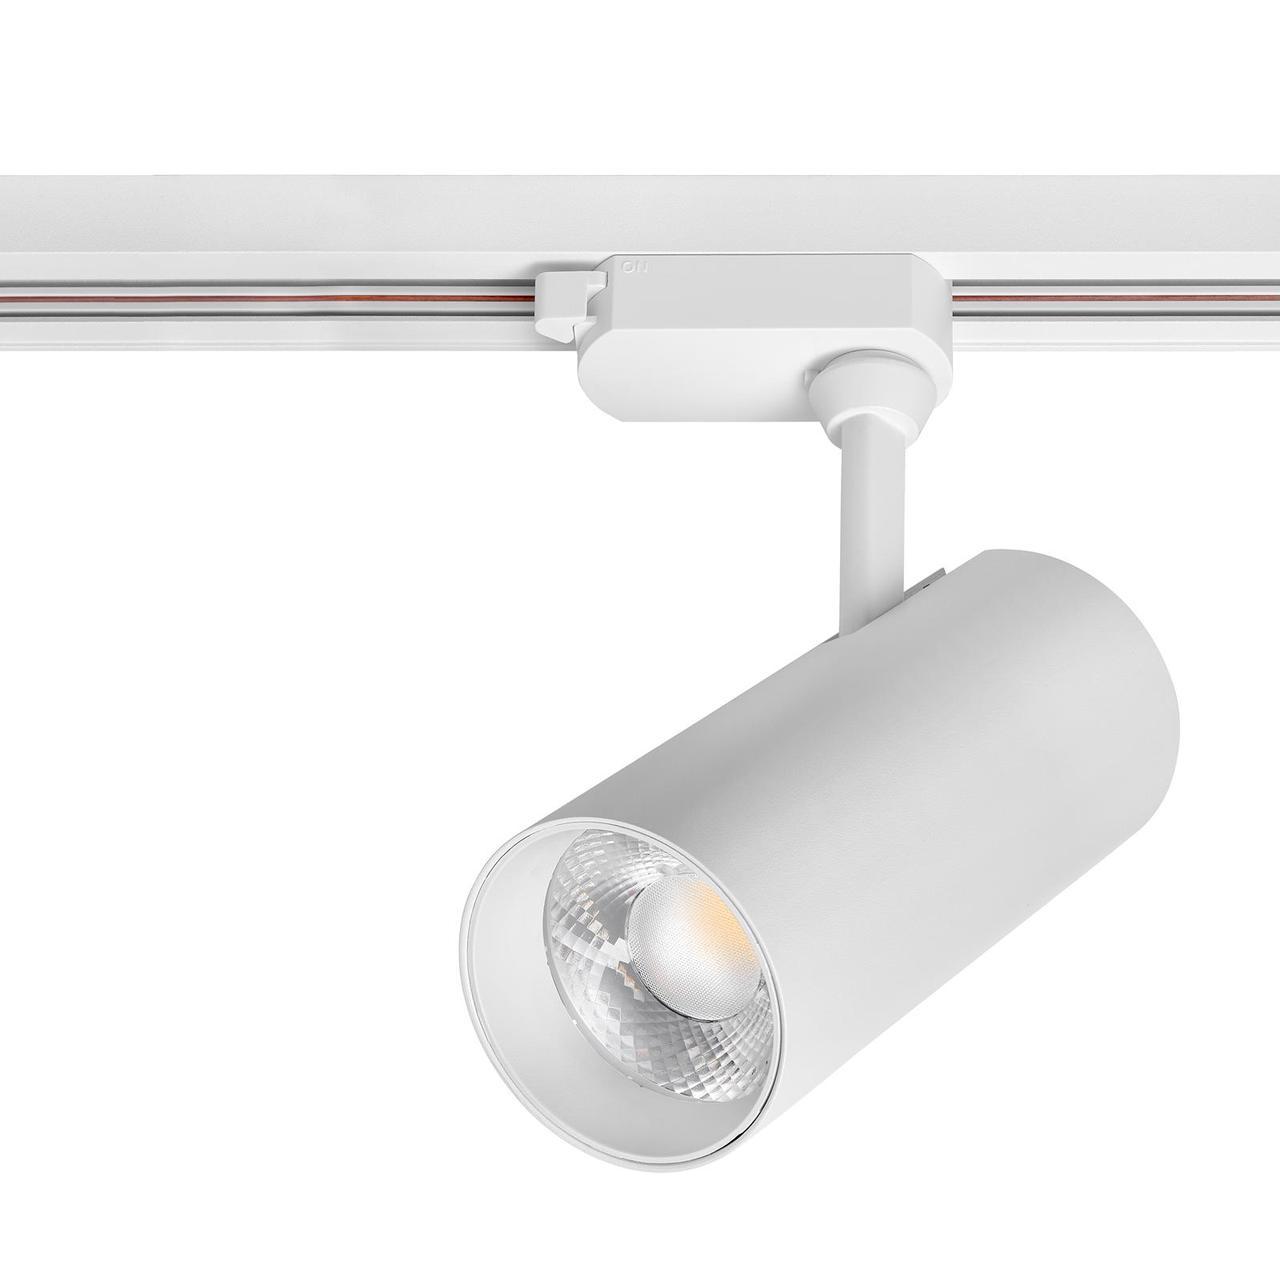 Лед прожектор трековый DELUX TL04 20 Вт  36°  4000K  белый